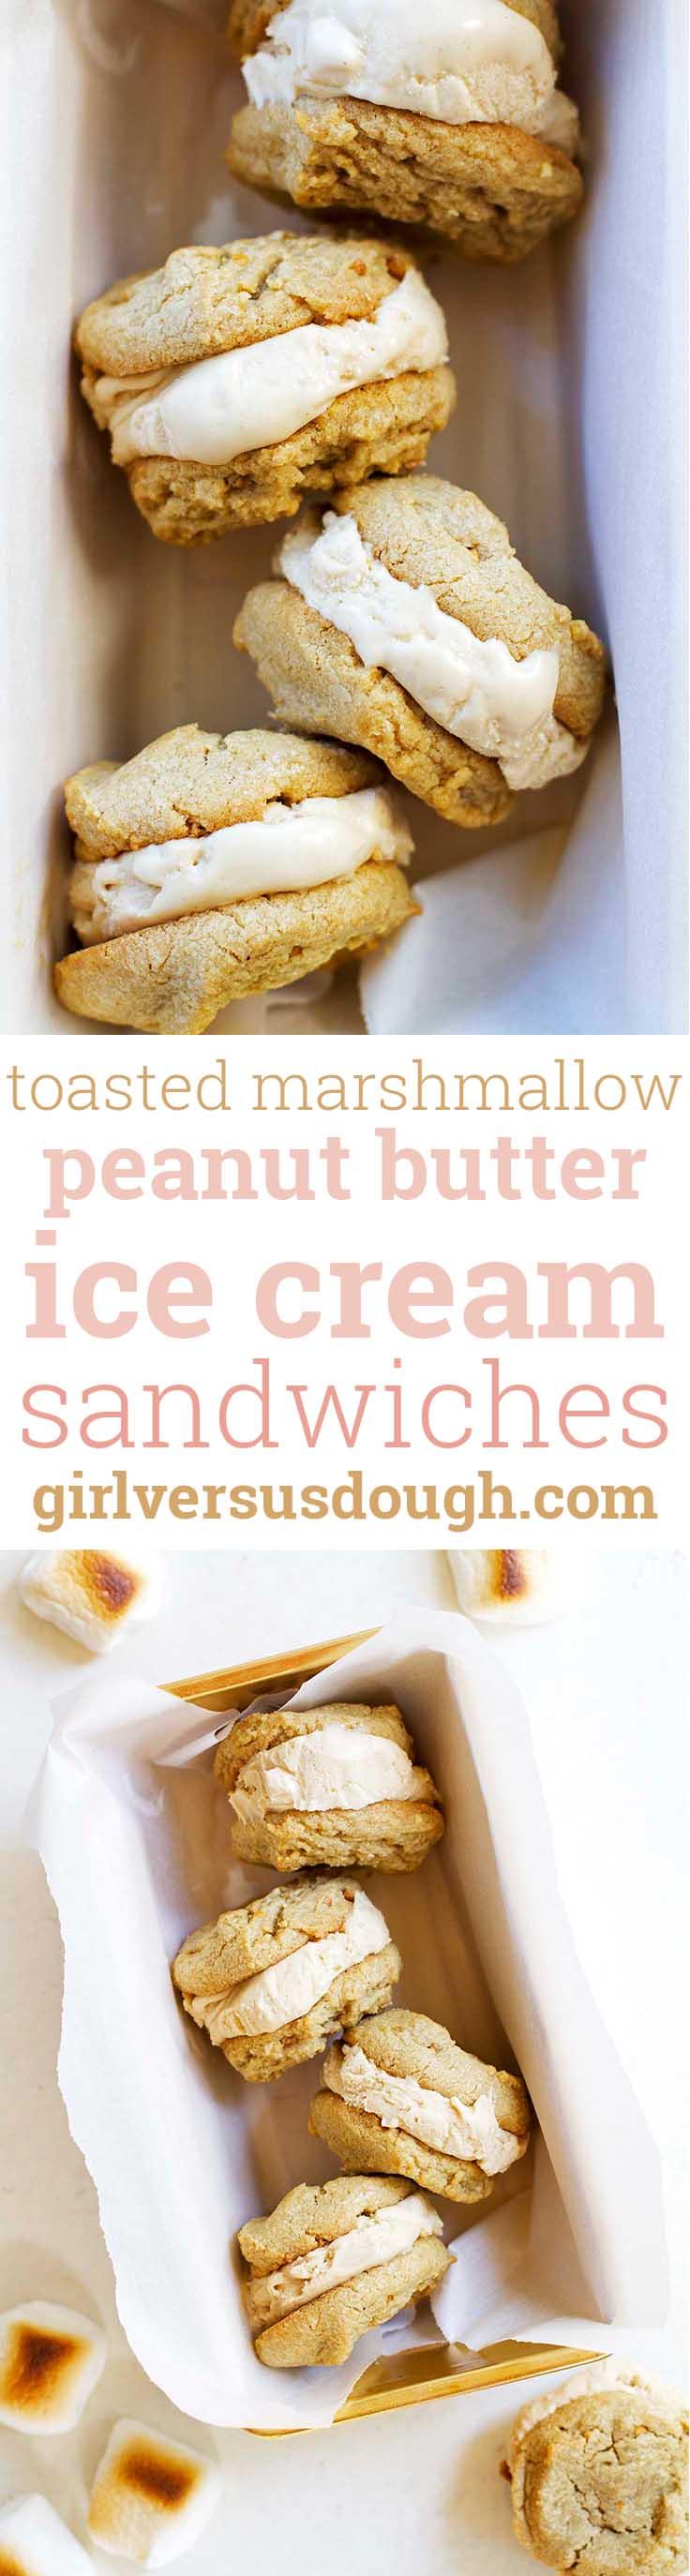 Toasted Marshmallow Peanut Butter Ice Cream Sandwiches -- Homemade toasted marshmallow peanut butter ice cream and soft peanut butter cookies sandwiched into one delicious treat. girlversusdough.com @girlversusdough